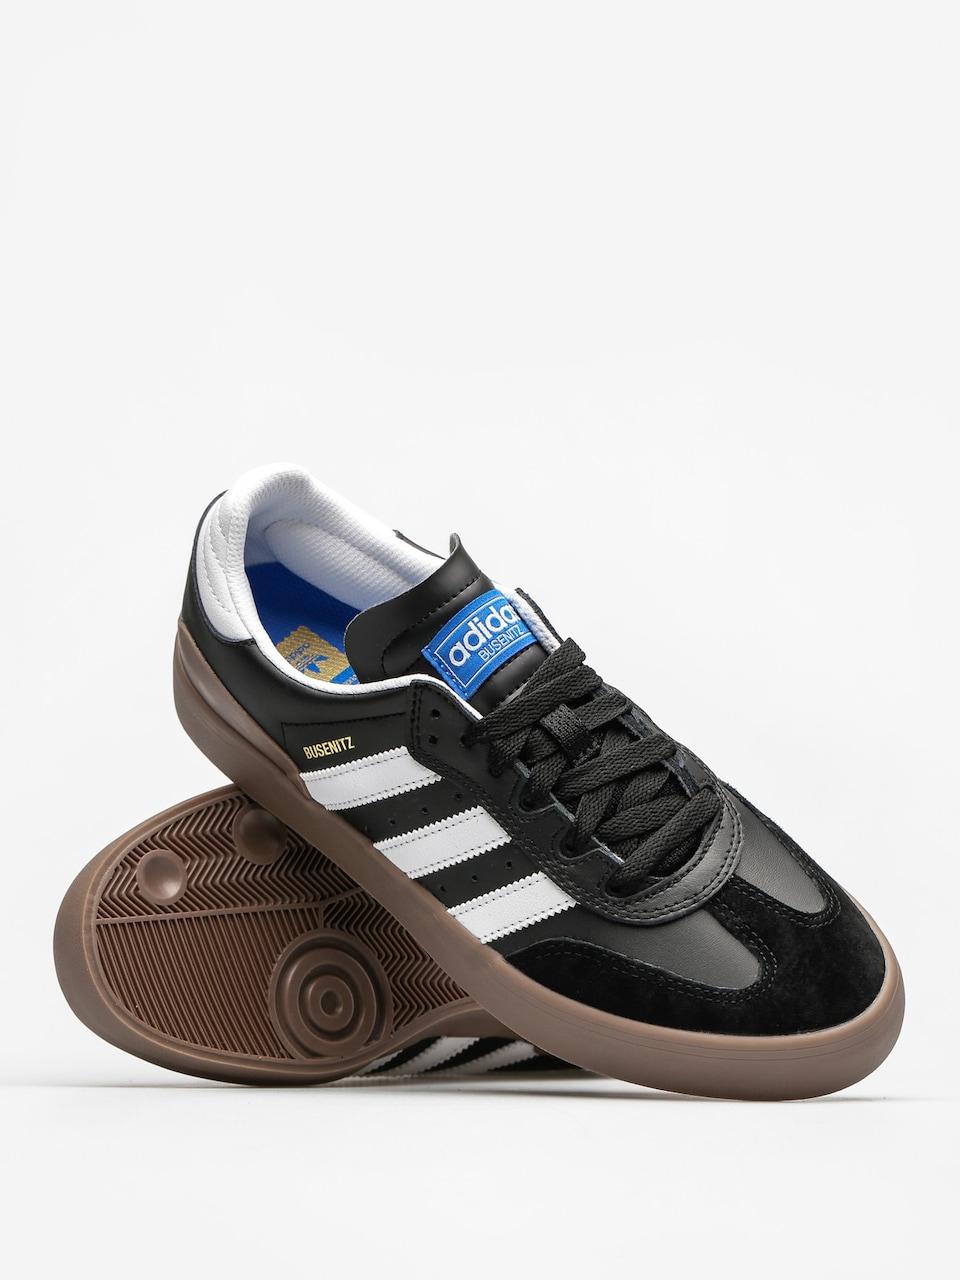 adidas Schuhe Busenitz Vulc Rx (core blackftwr whitegum5)